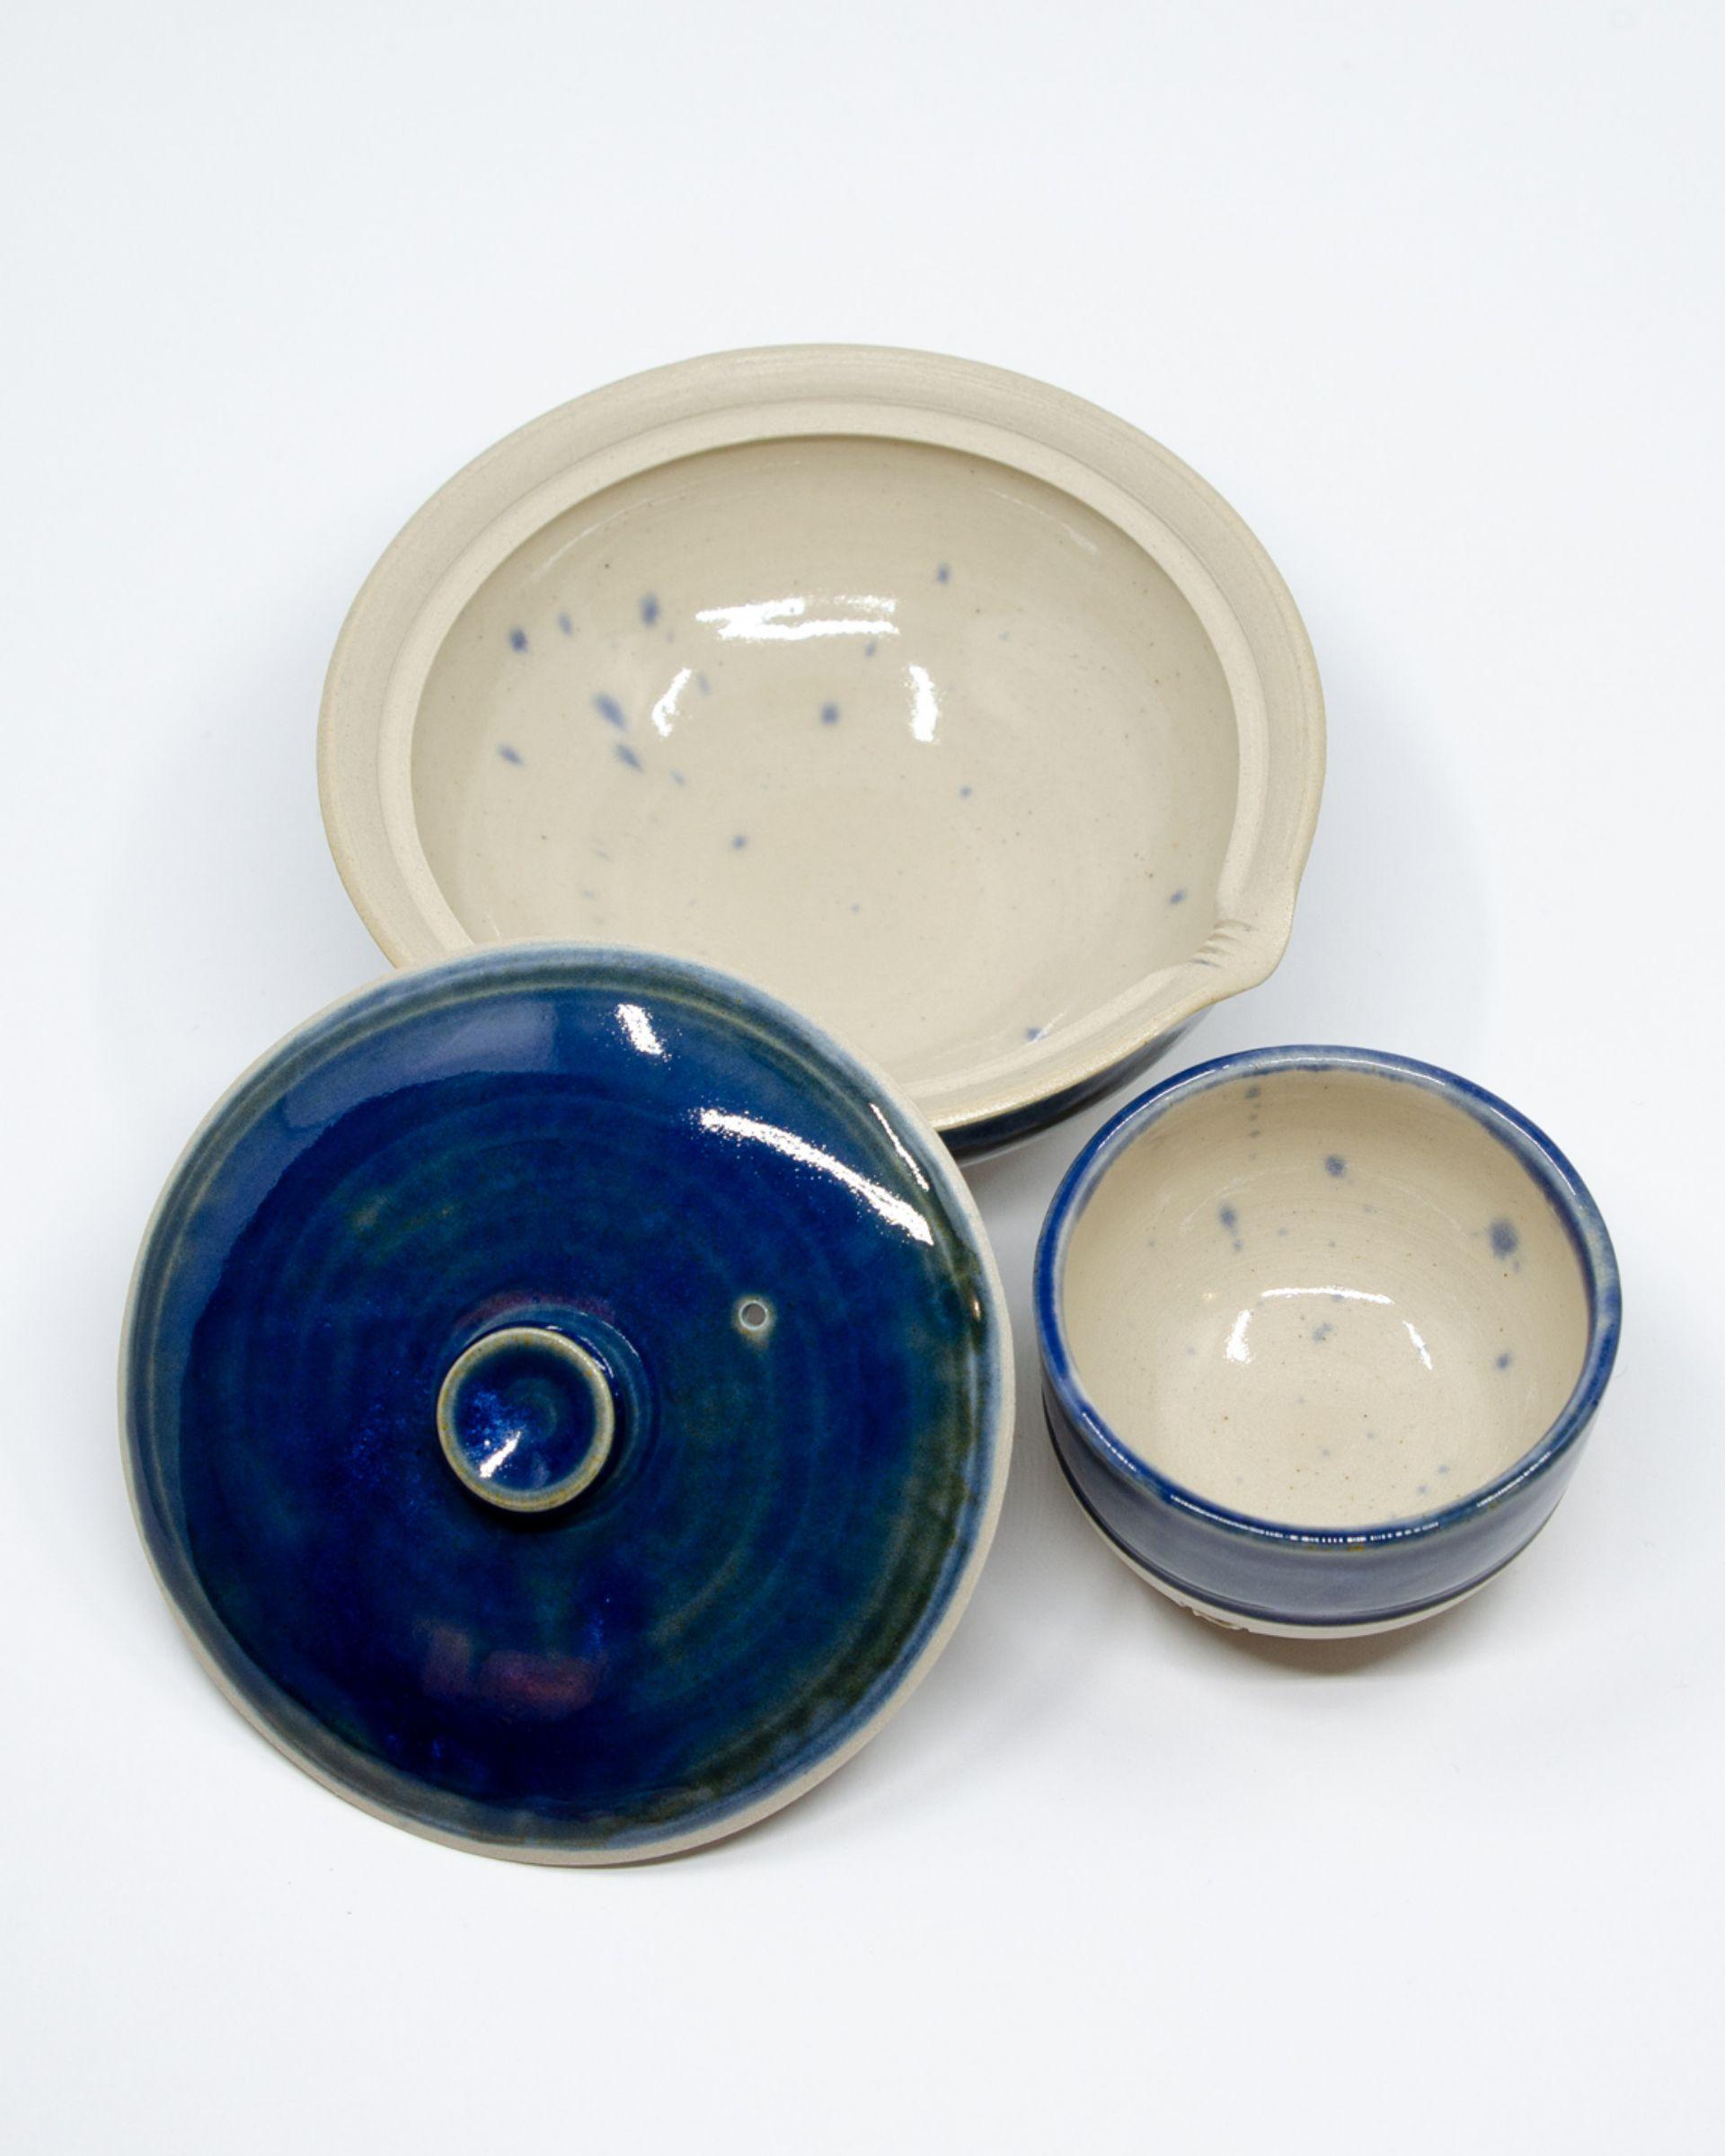 #teapotcollector #poterie #japanesestyle #ceramics #shiboridashi #thé #ceramiclove  #théière #handmadepotteryart #handmadeteapot #gosha_ceramics #gres #ceramiques #tea #teatime #blueteapot #wheelthrownpottery #potterofinstagram #tealovers #funcionalpottery #kitchenaccents #blueceramics #decorationmaison #blueteapot #japaneselover #wheelthrown